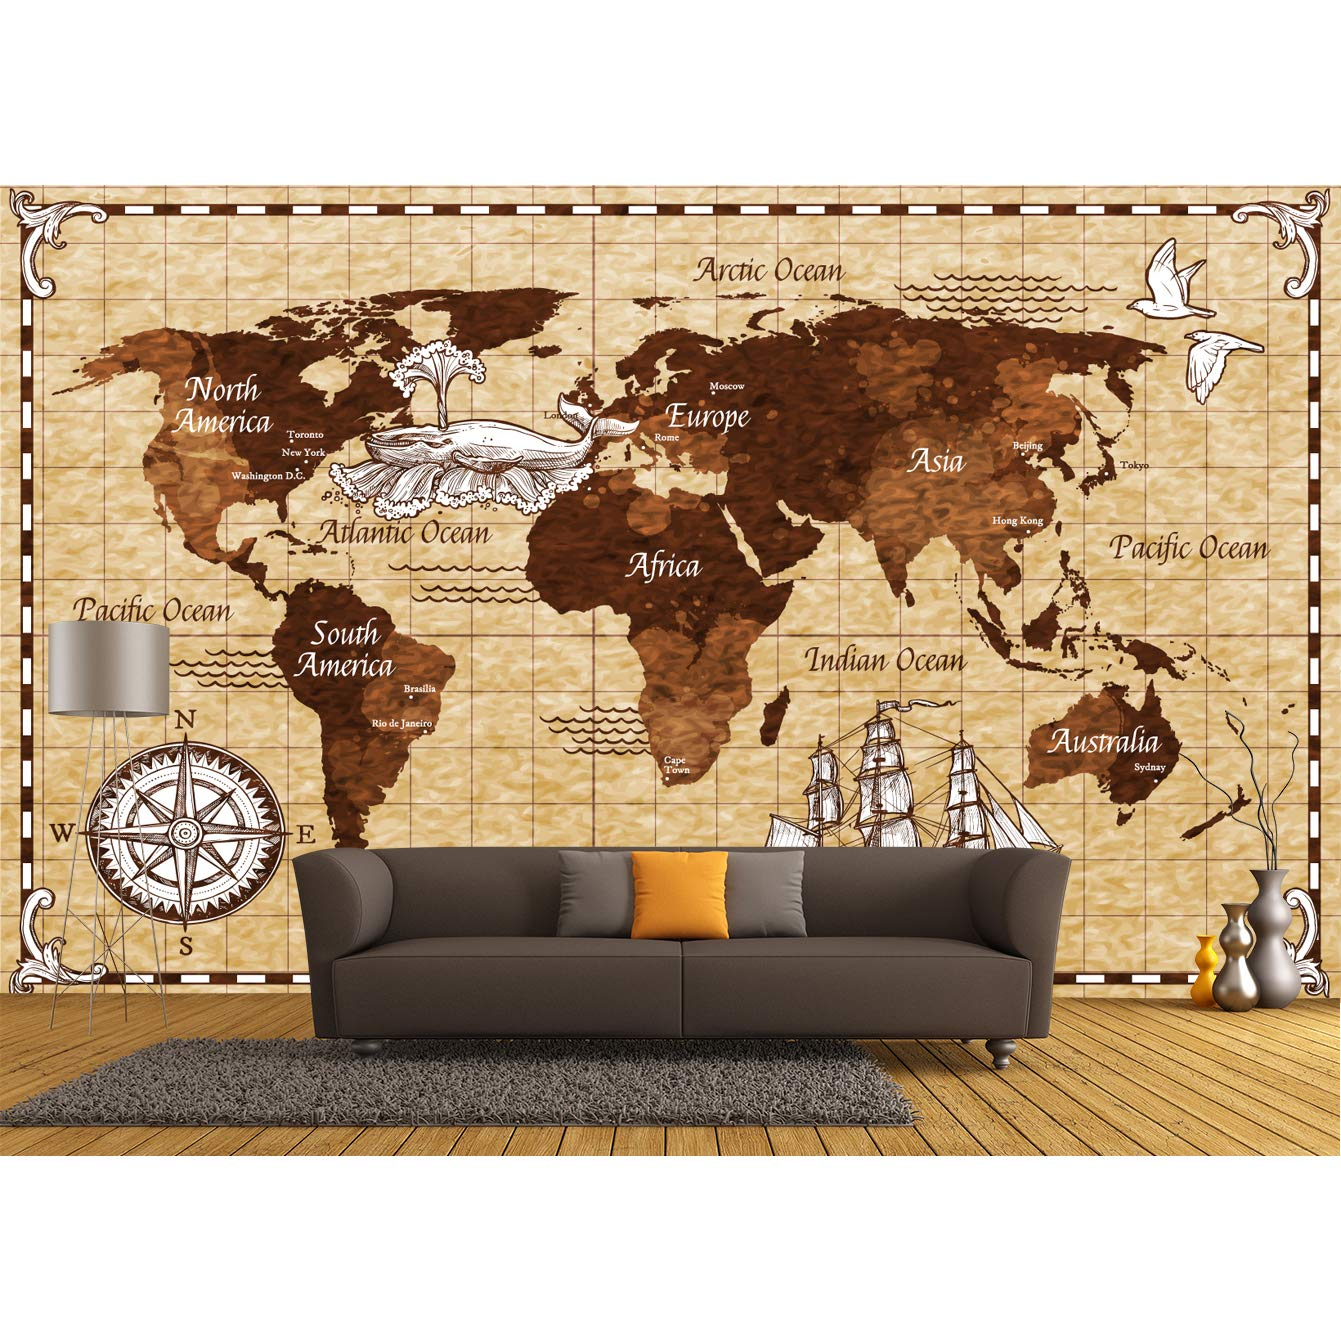 Latest item Vintage World Map Seasonal Wrap Introduction Wallpaper Mural. Wallpaper. Remo Self-Adhesive